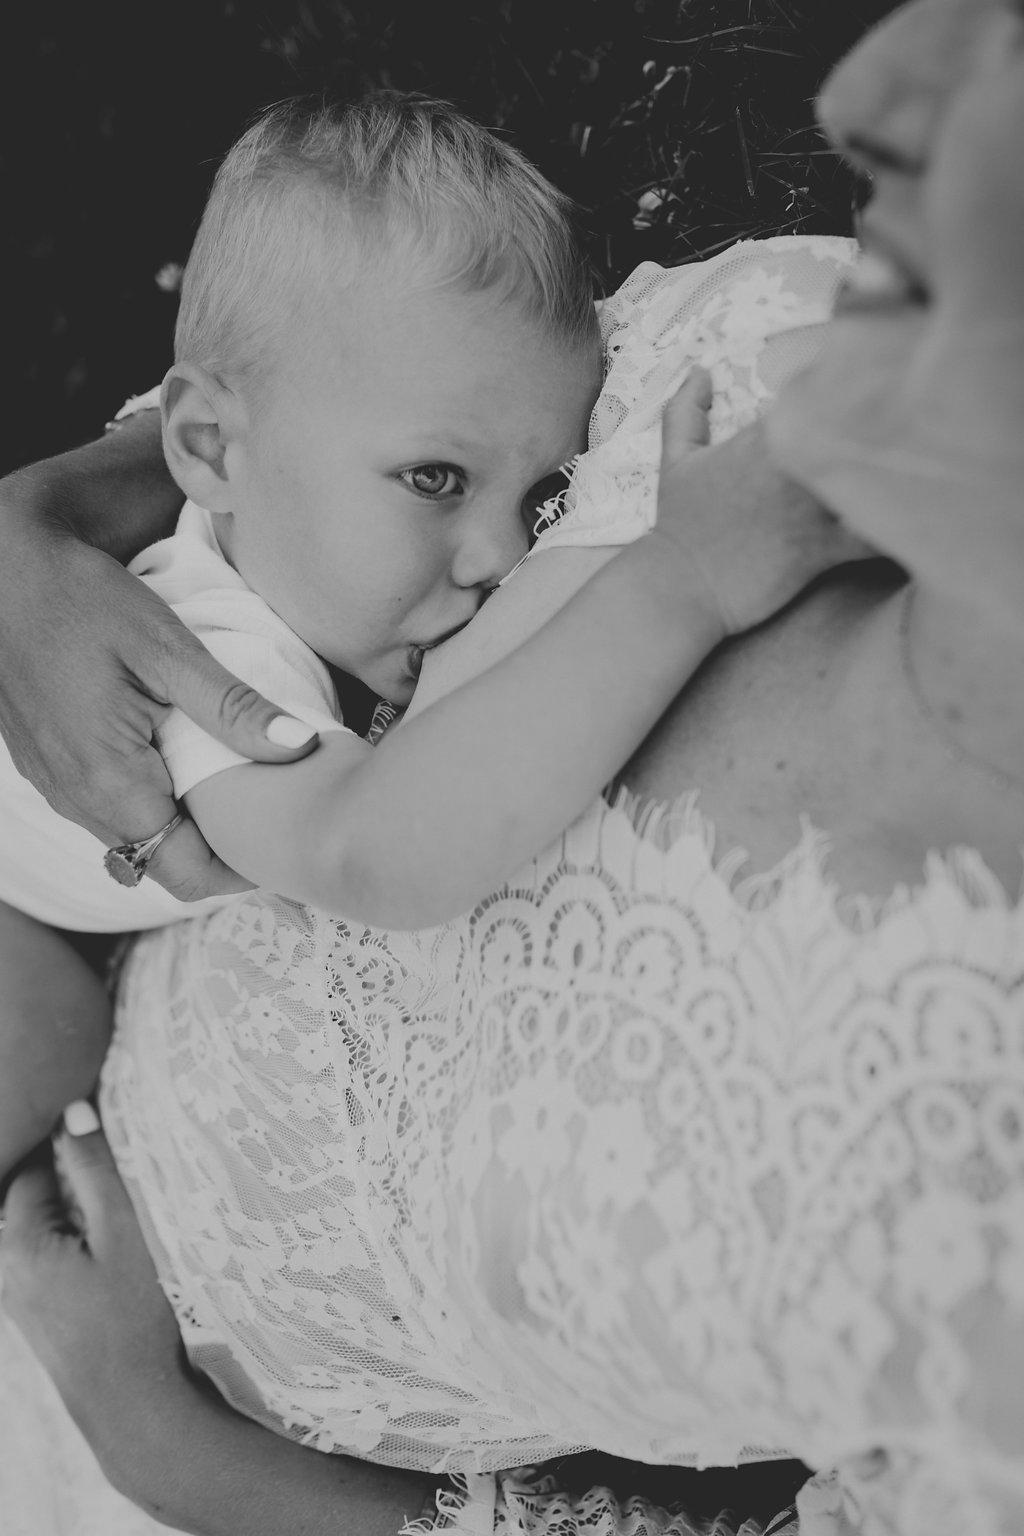 L'allaitement selon Sacha, maman de Clarence 21 mois - Blog famille Sunday Grenadine